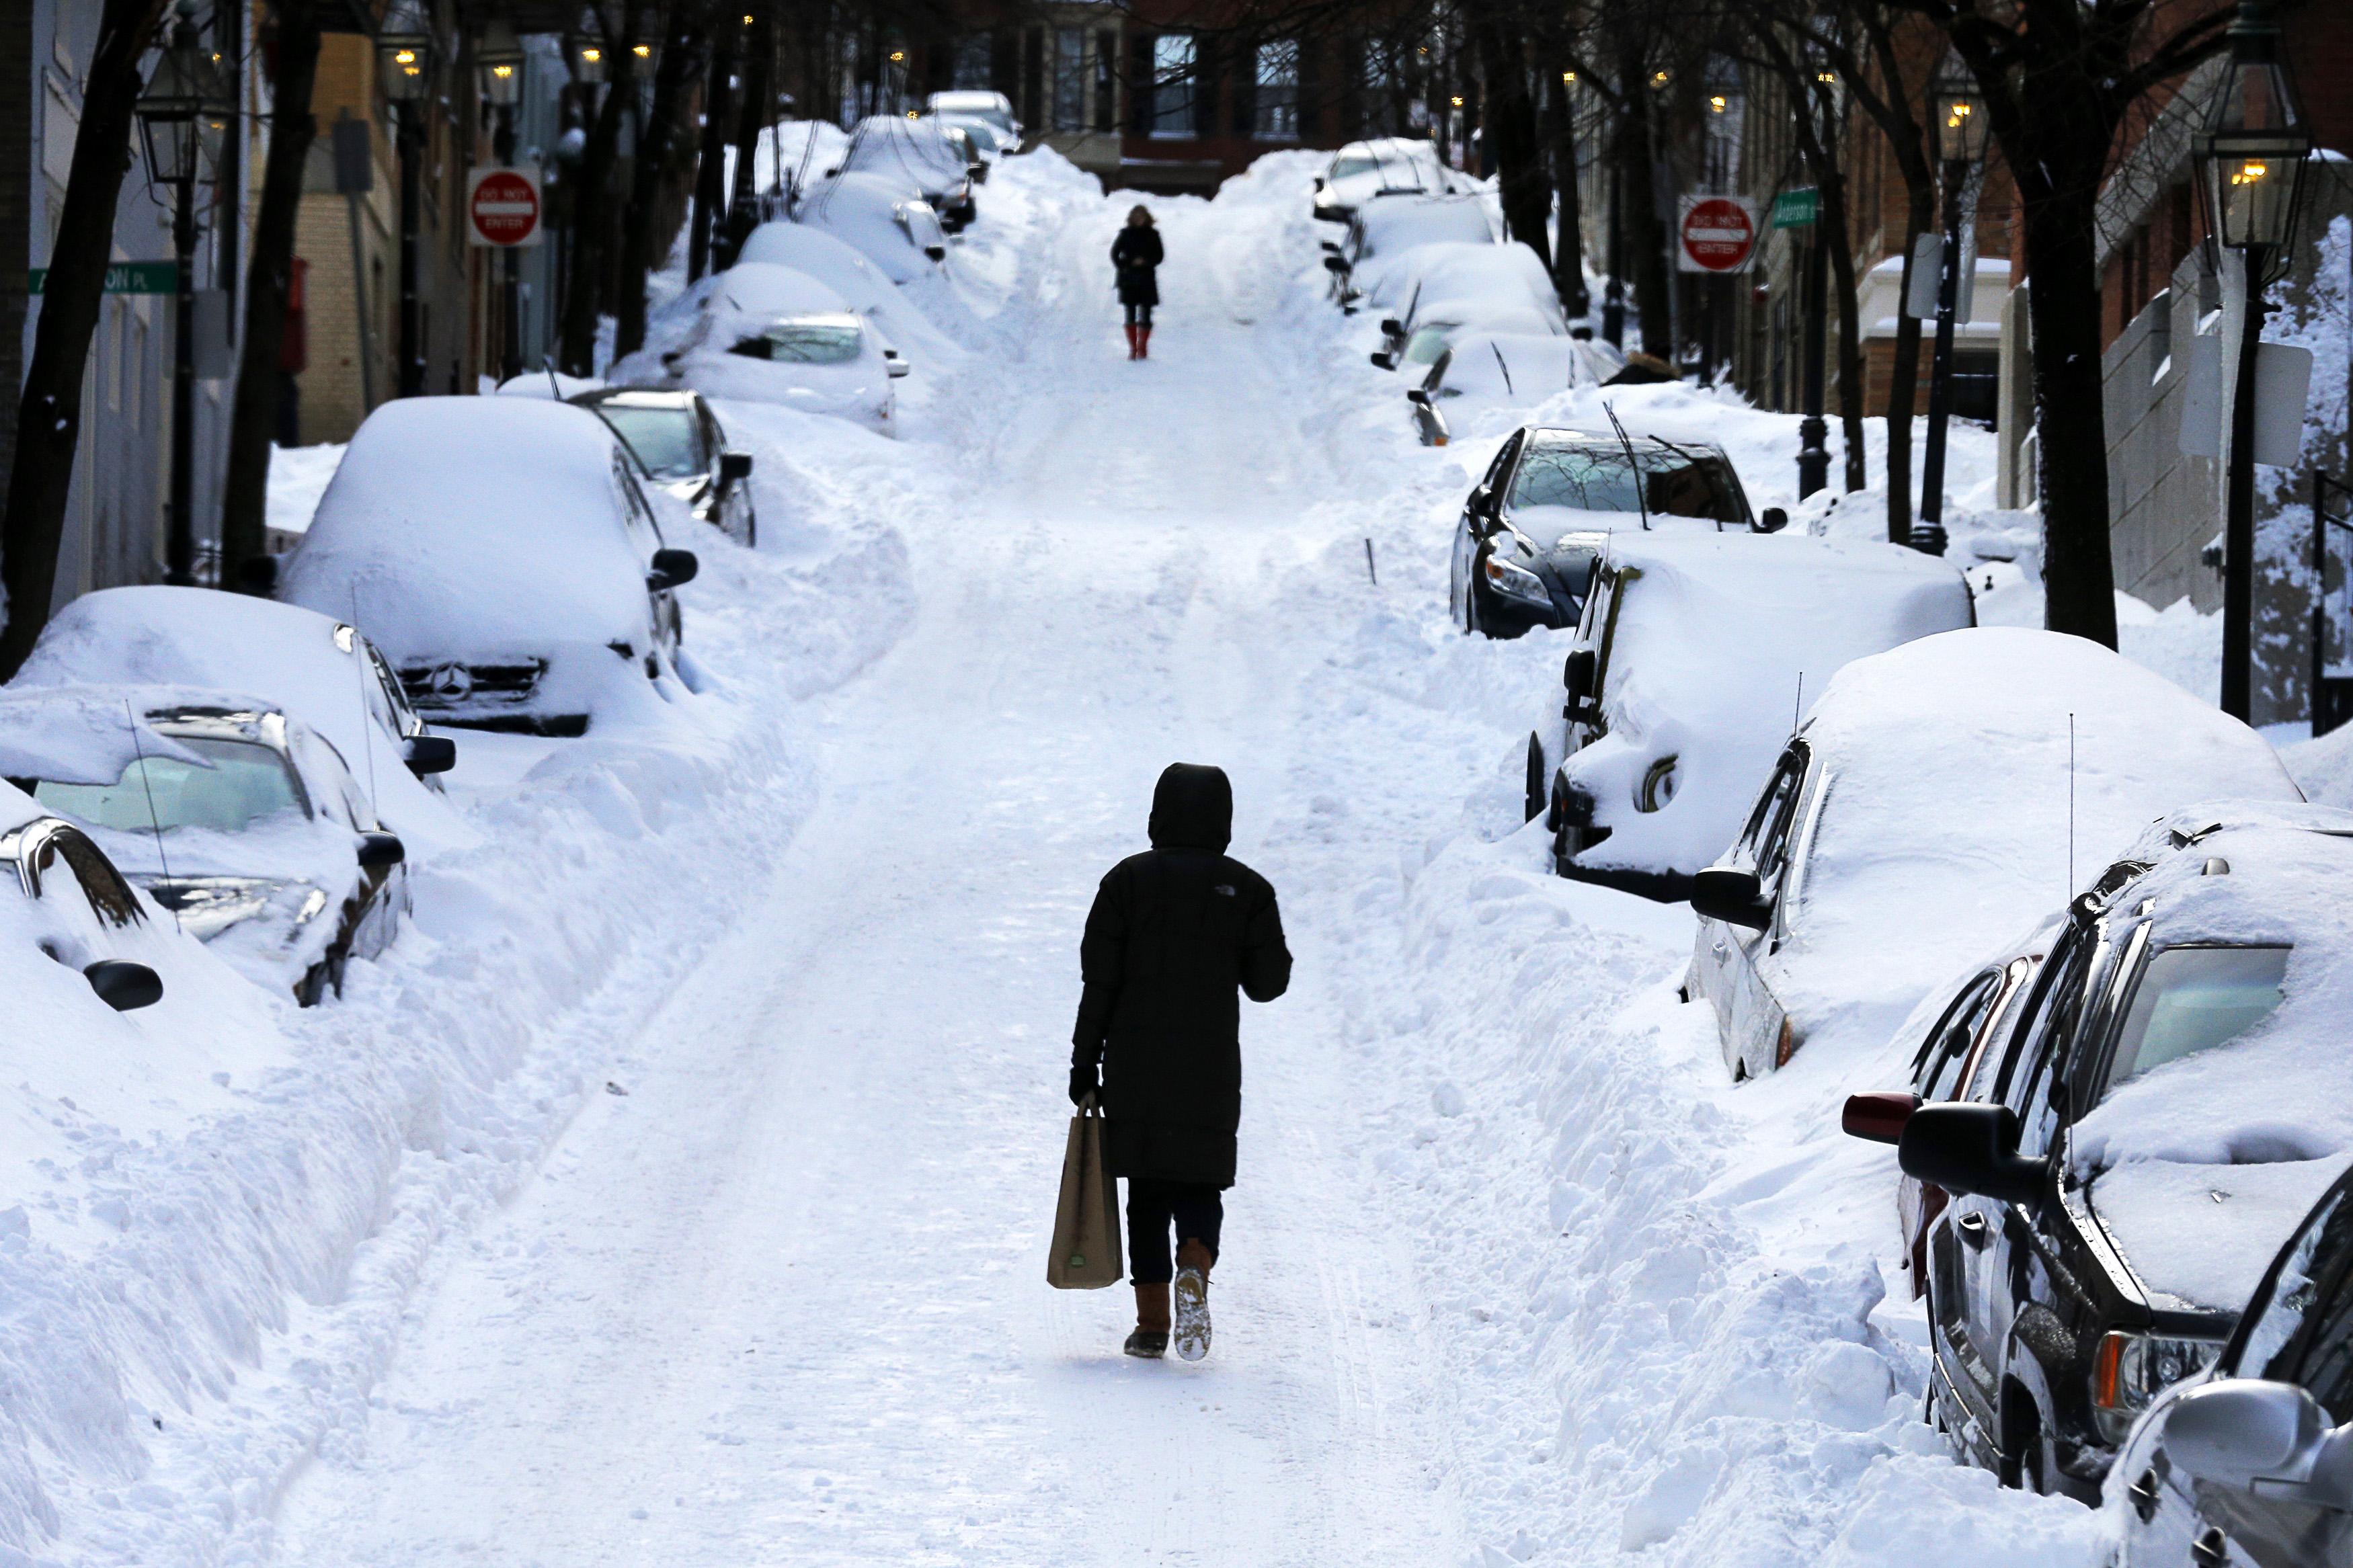 A pedestrian walks in the middle of the street following a winter blizzard in Boston